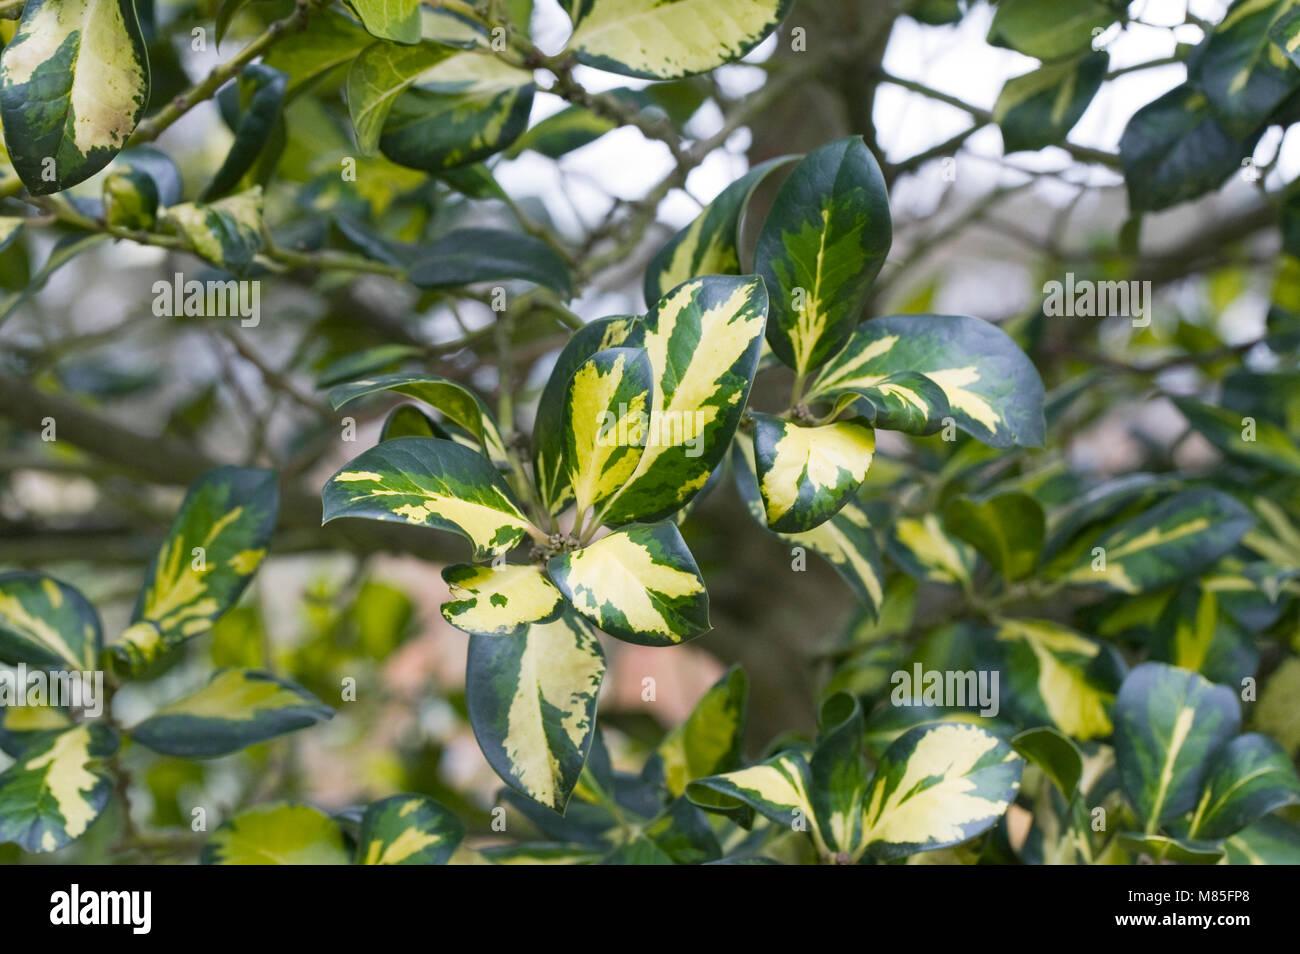 Ilex x altaclerensis 'Ripley Gold'. Photo Stock